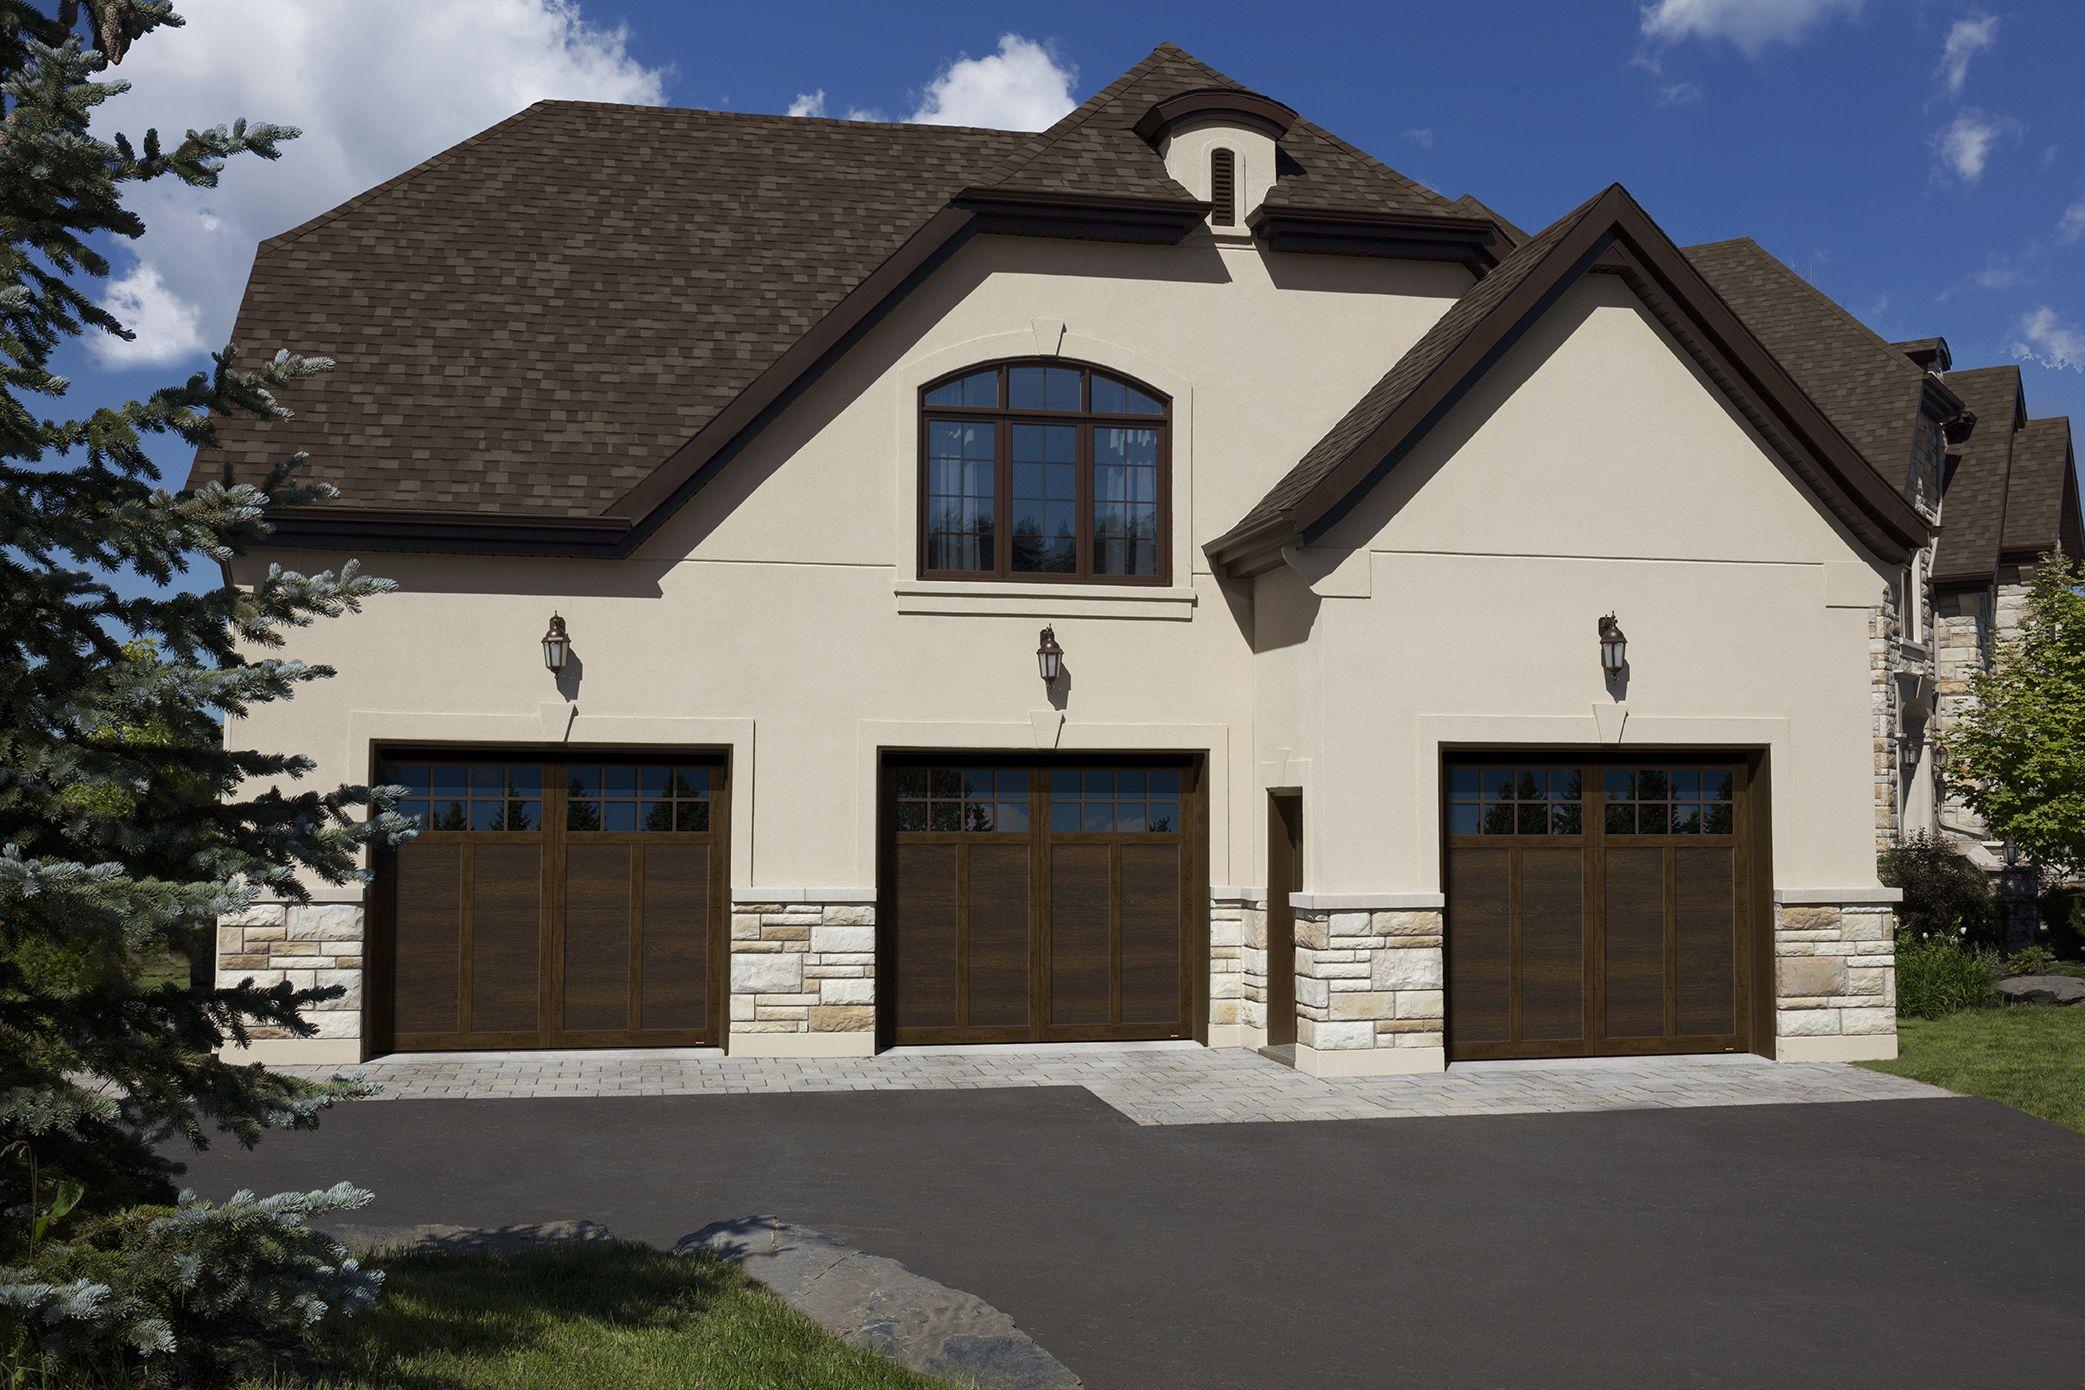 Princeton P 12 9 X 8 Chocolate Walnut Doors And Overlays 8 Lite Panoramic Windows Walnut Doors House Styles